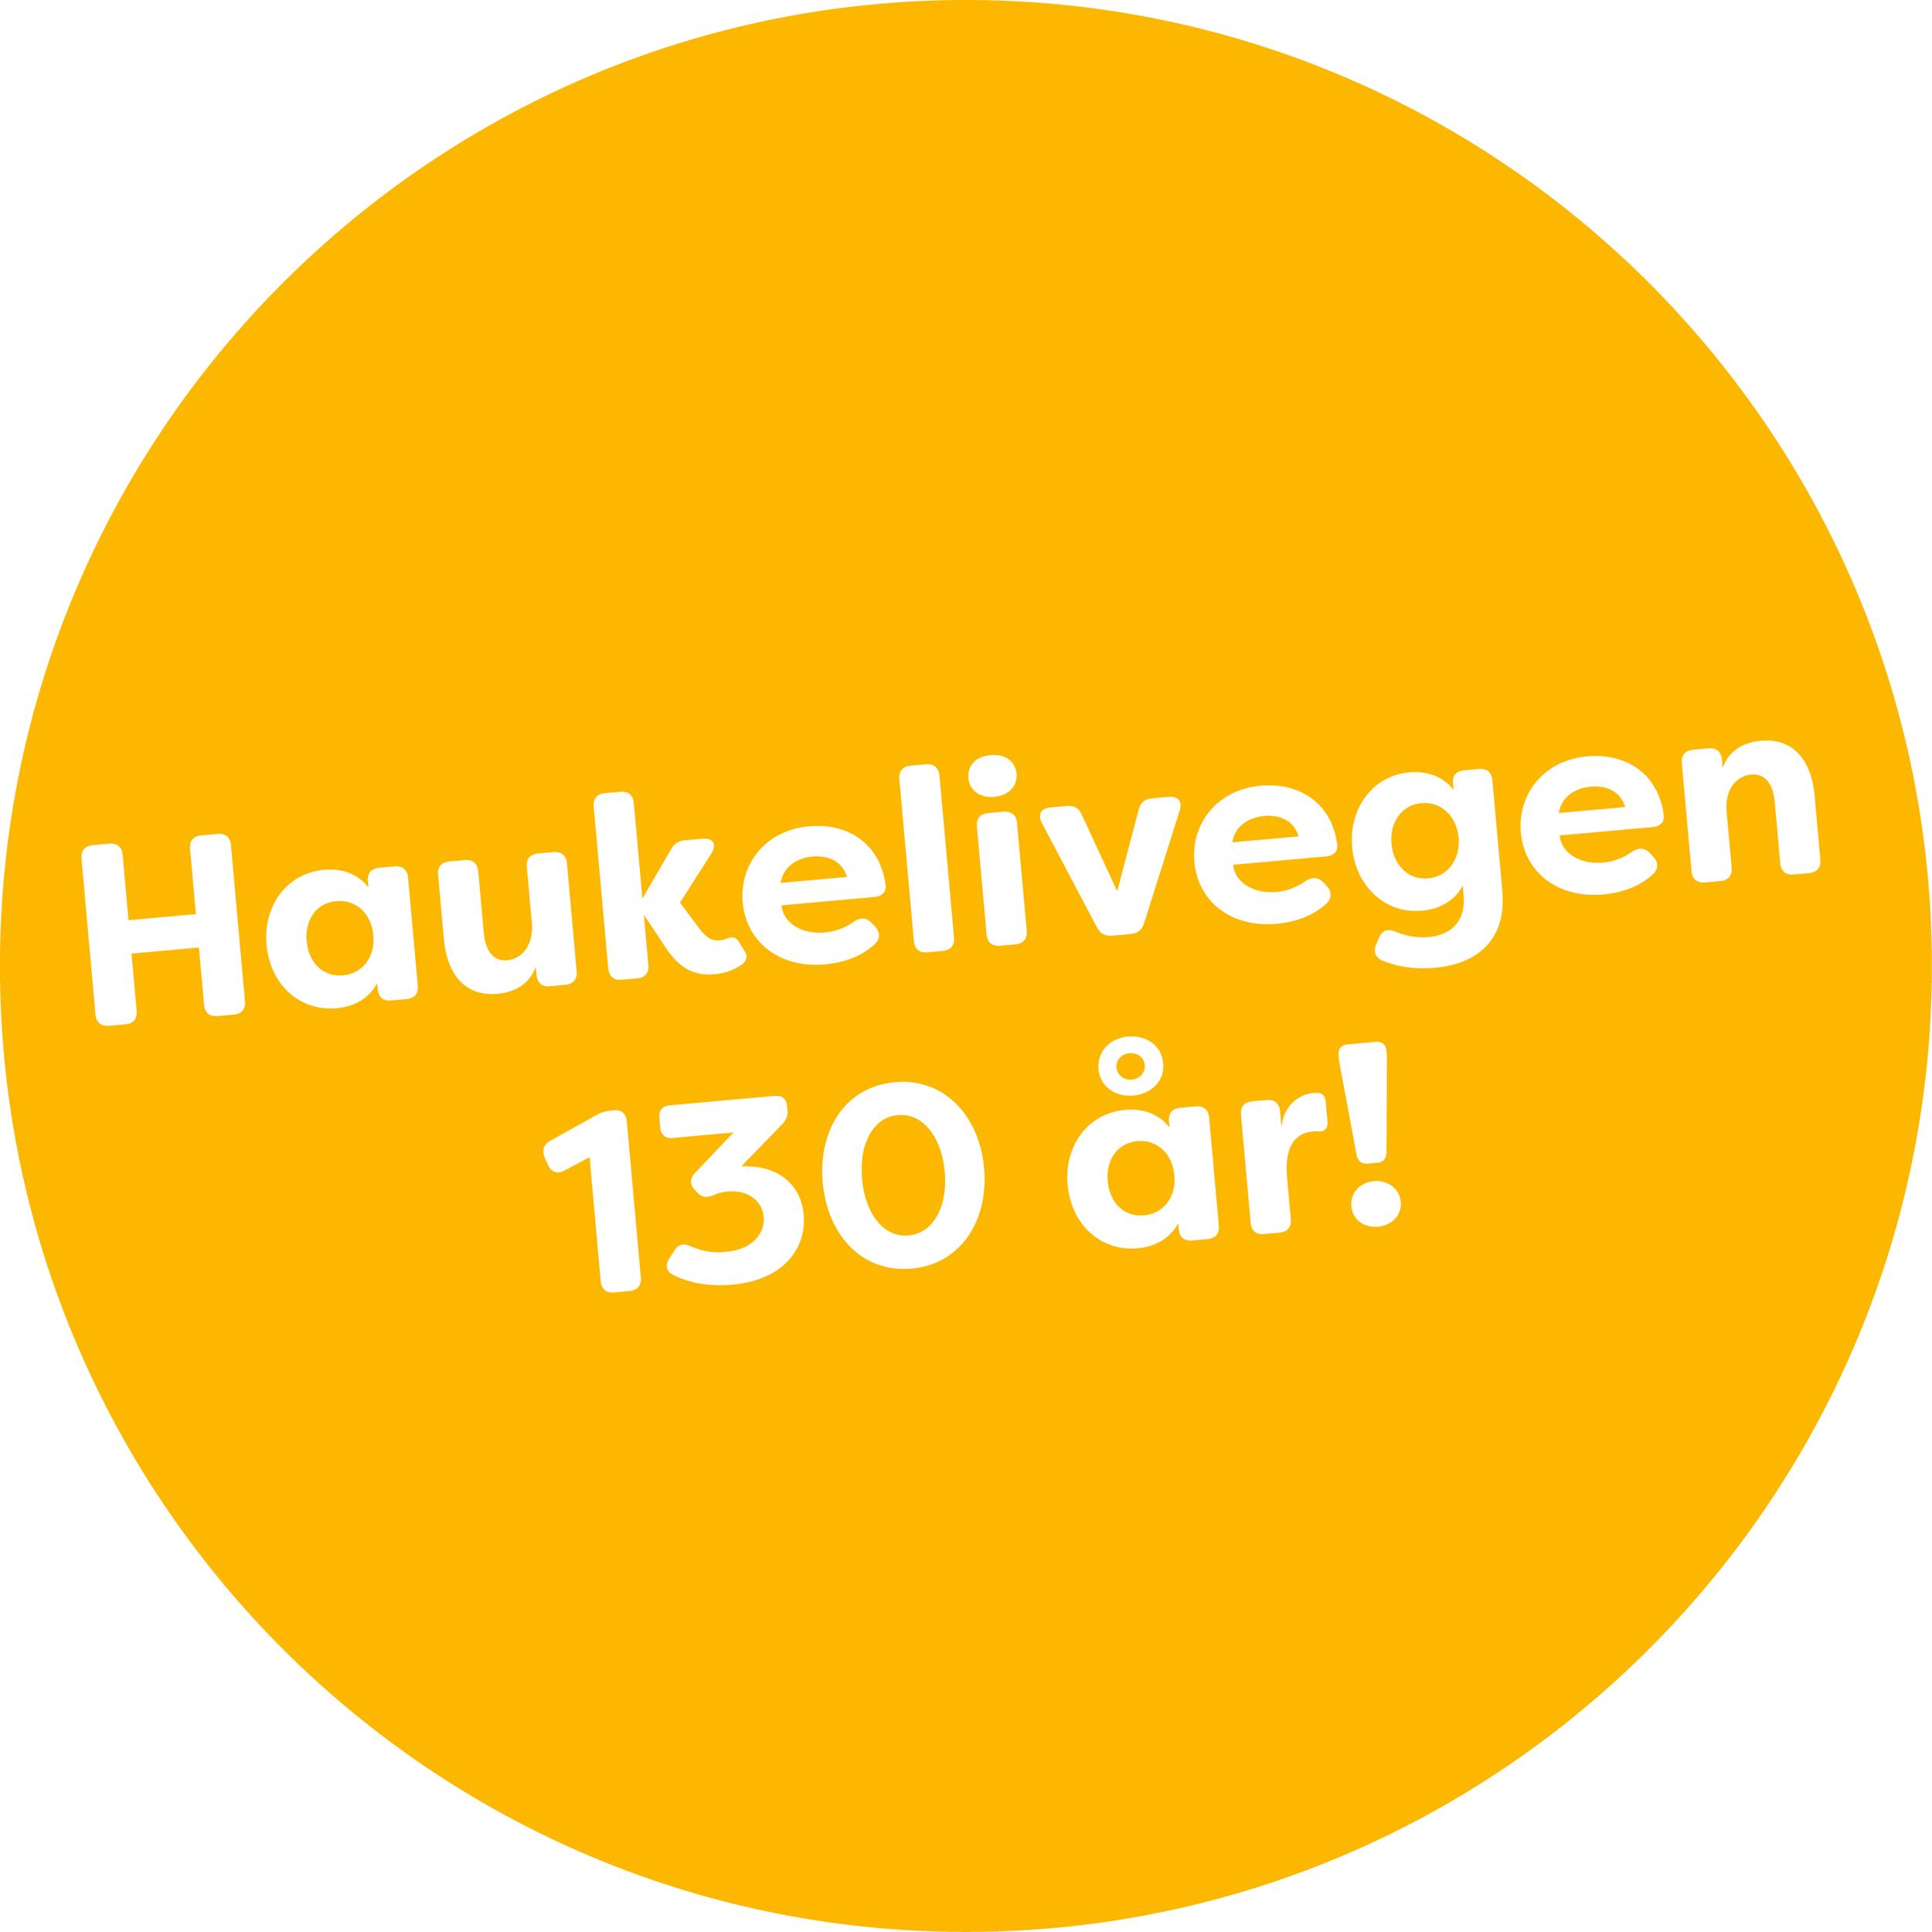 Gul runding Haukelivegen 130 år.png